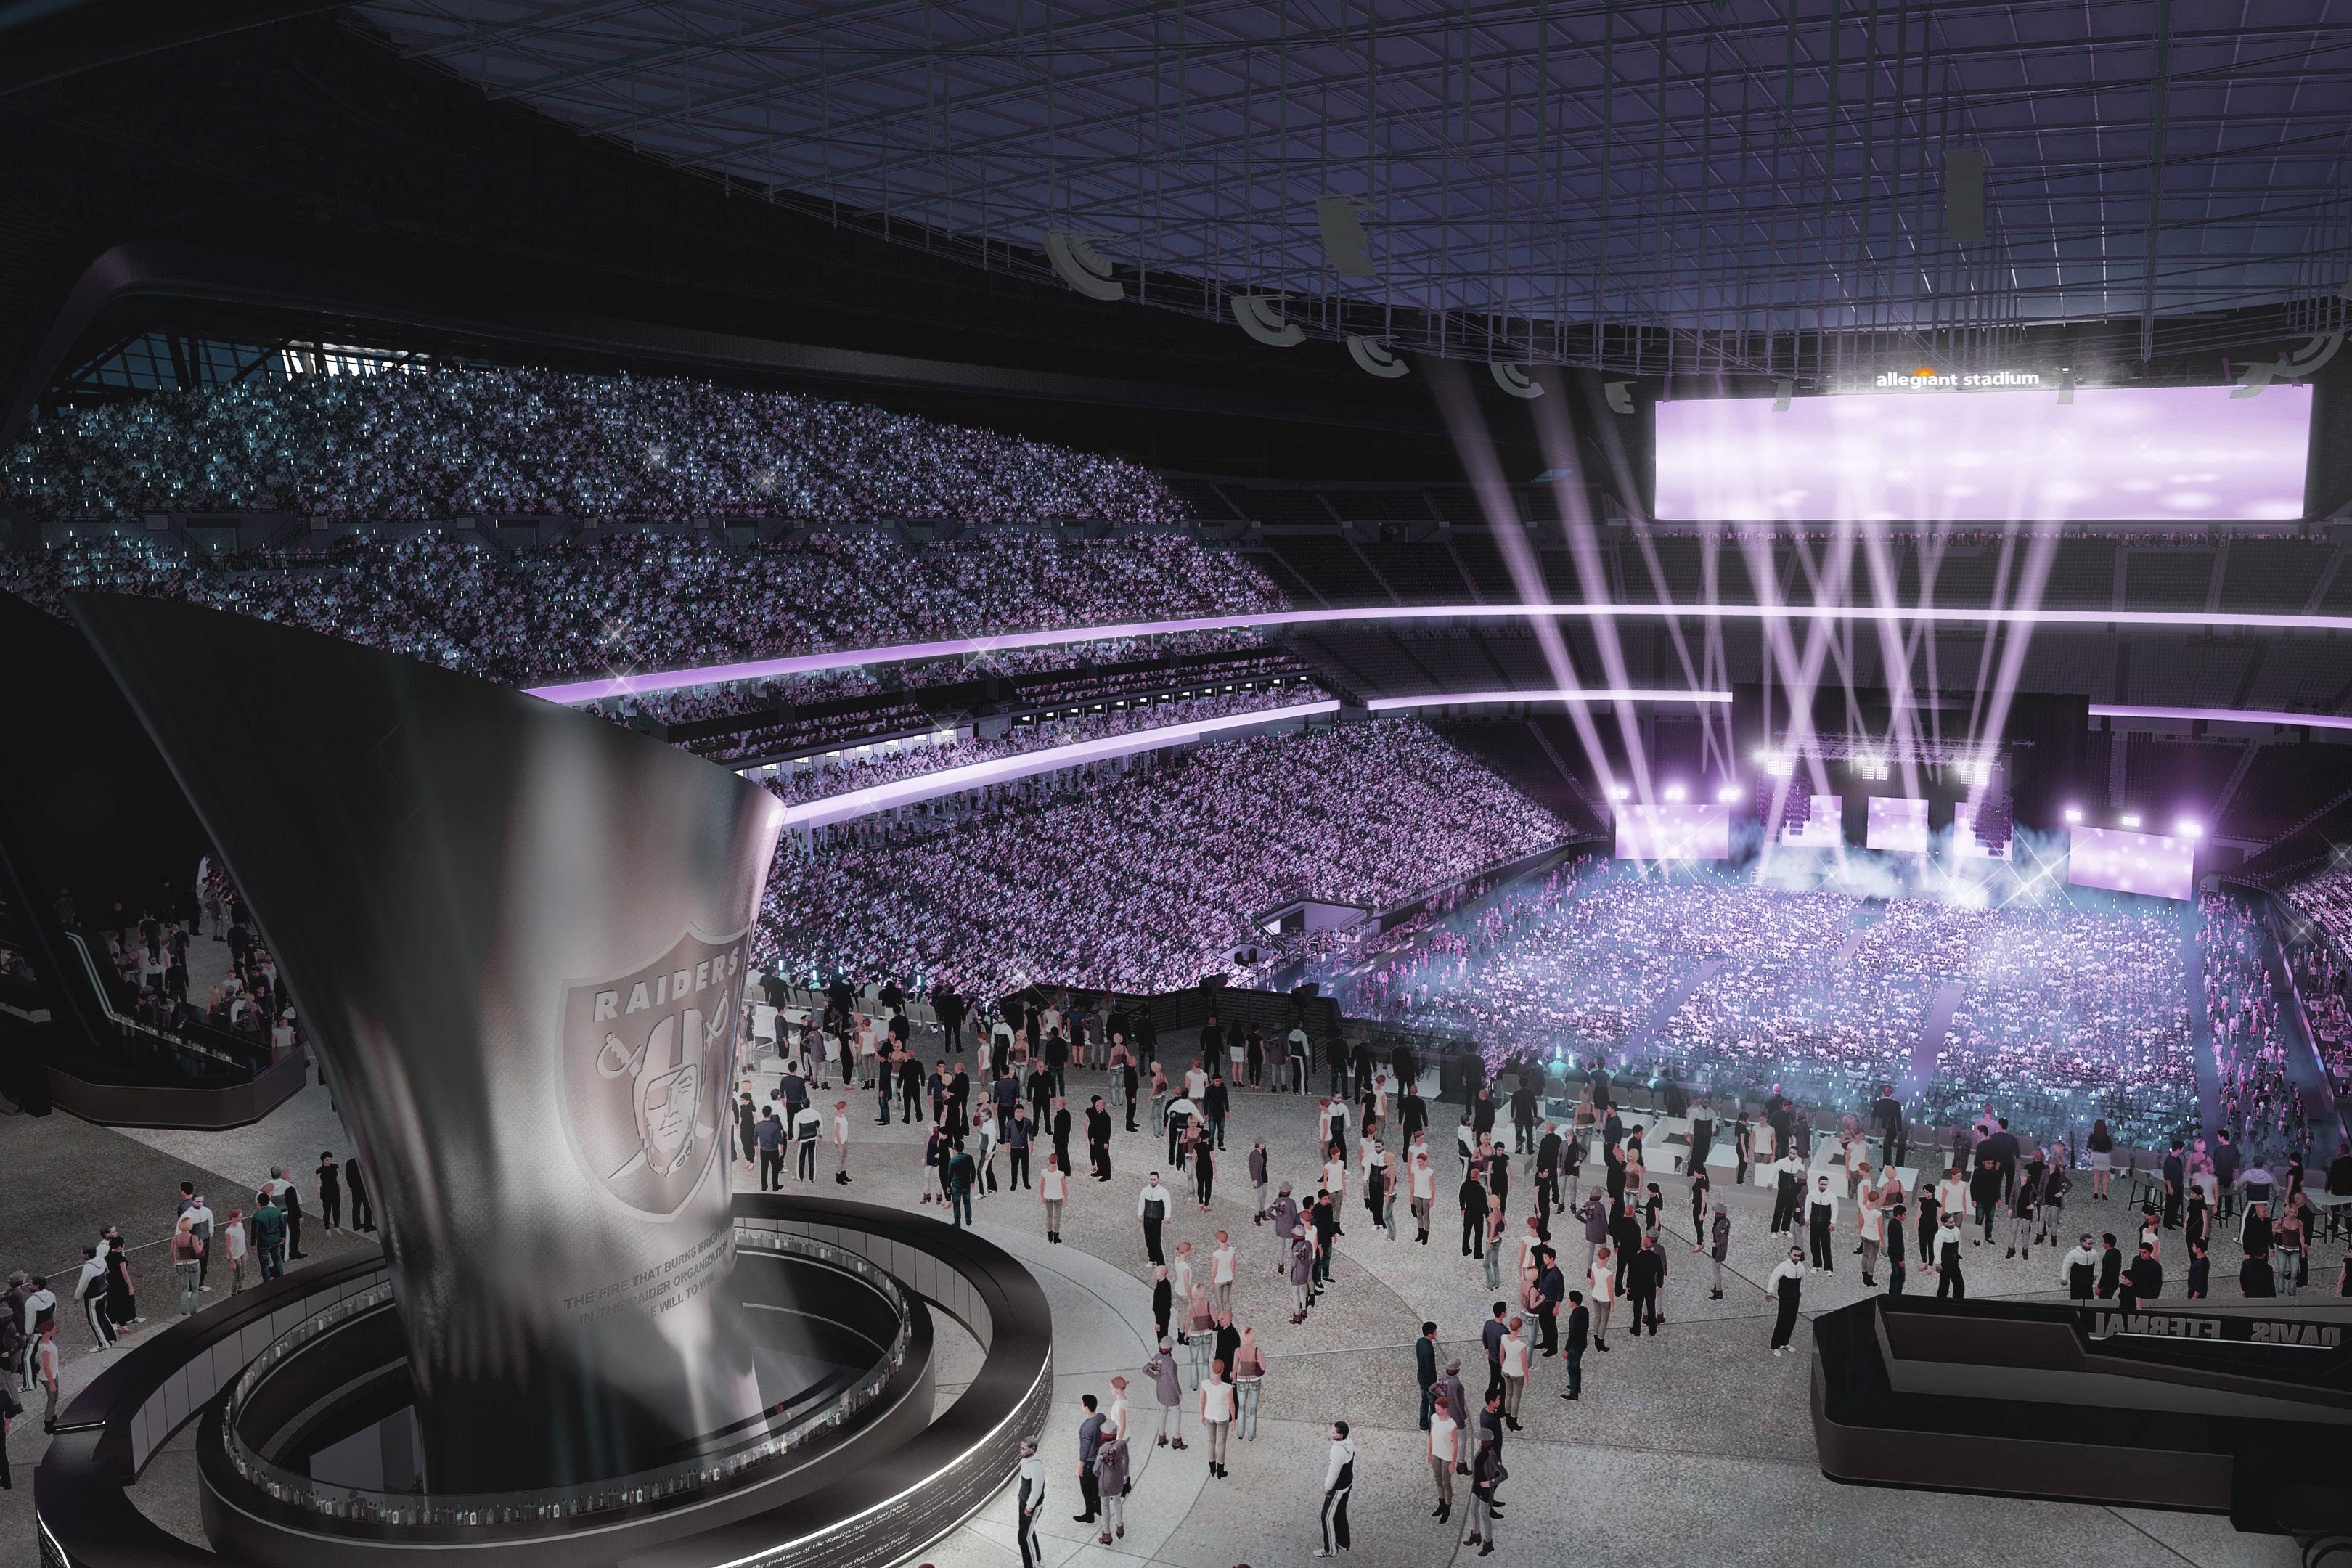 Raiders_AllegiantStadium_Concert_Peristyle-End-Stage_cropped